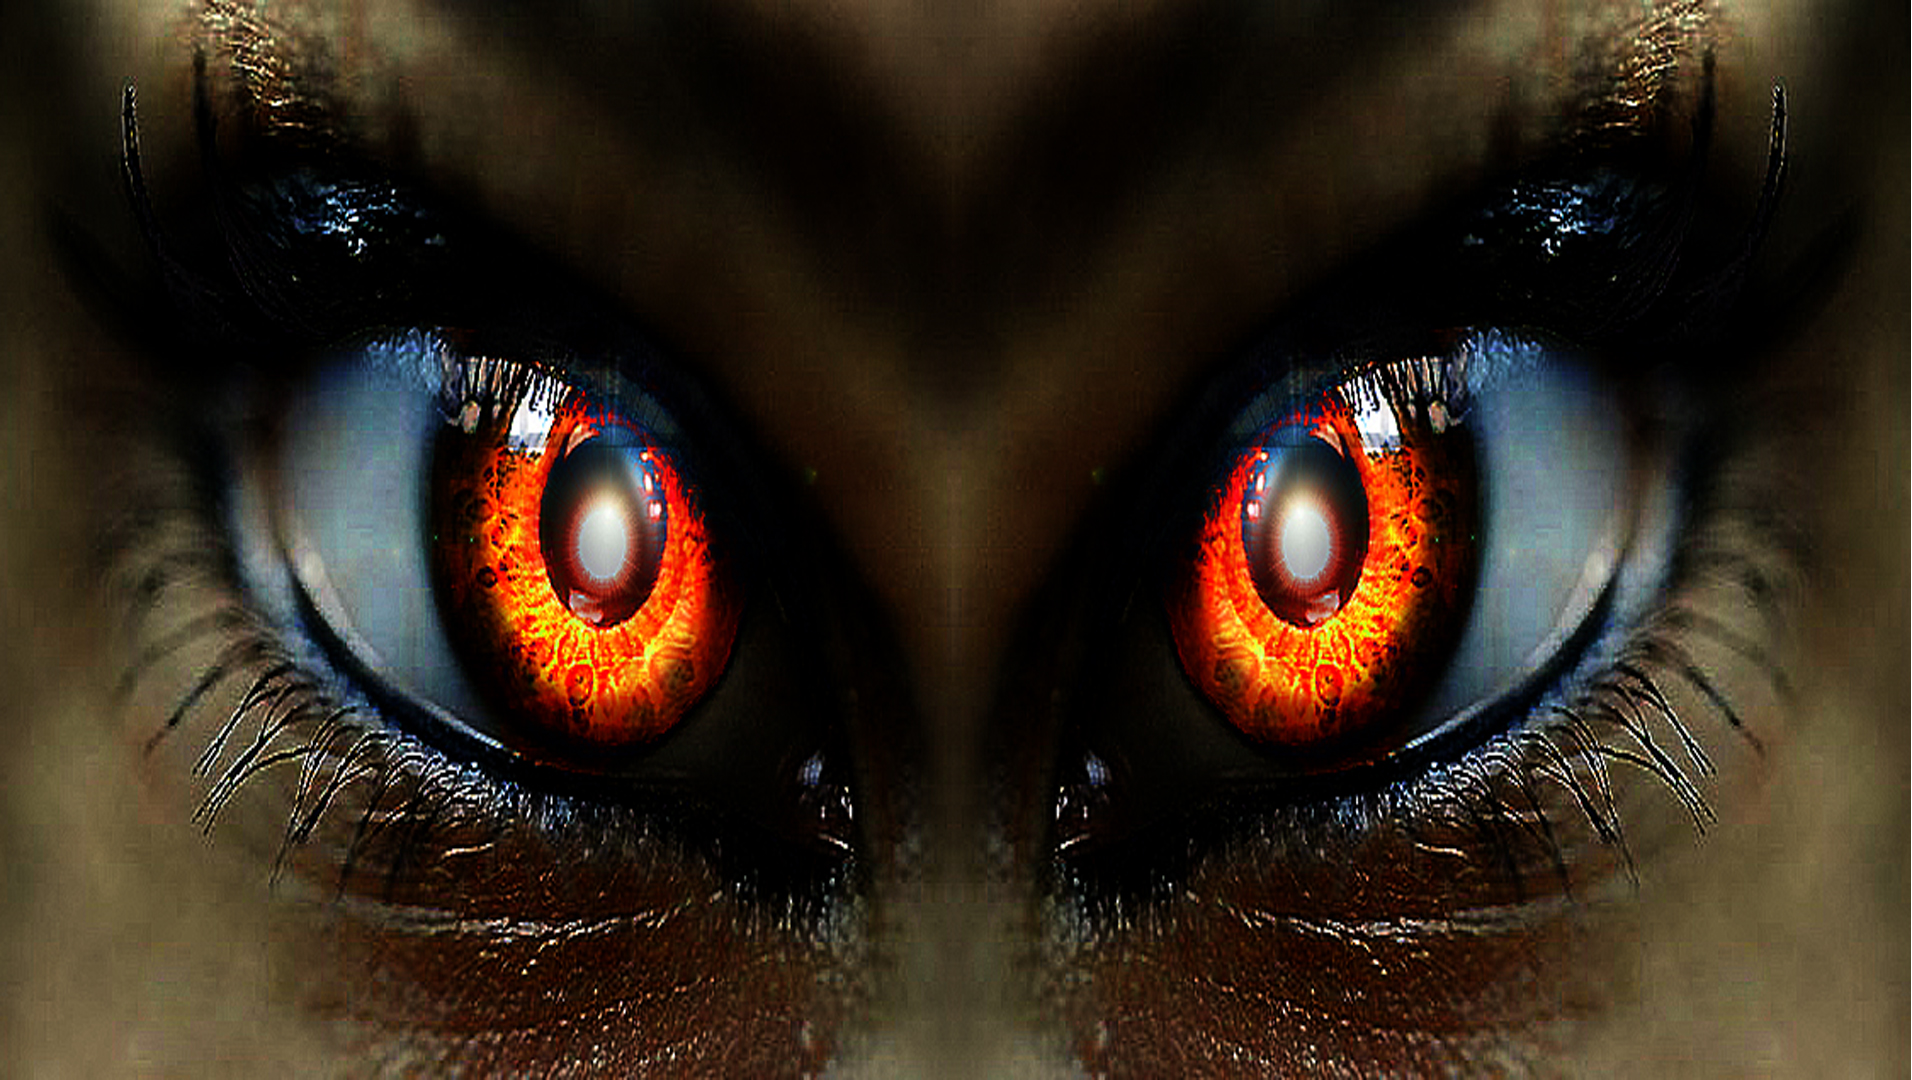 Evil Eyes Wallpaper wallpaper wallpaper hd background desktop 1912x1080